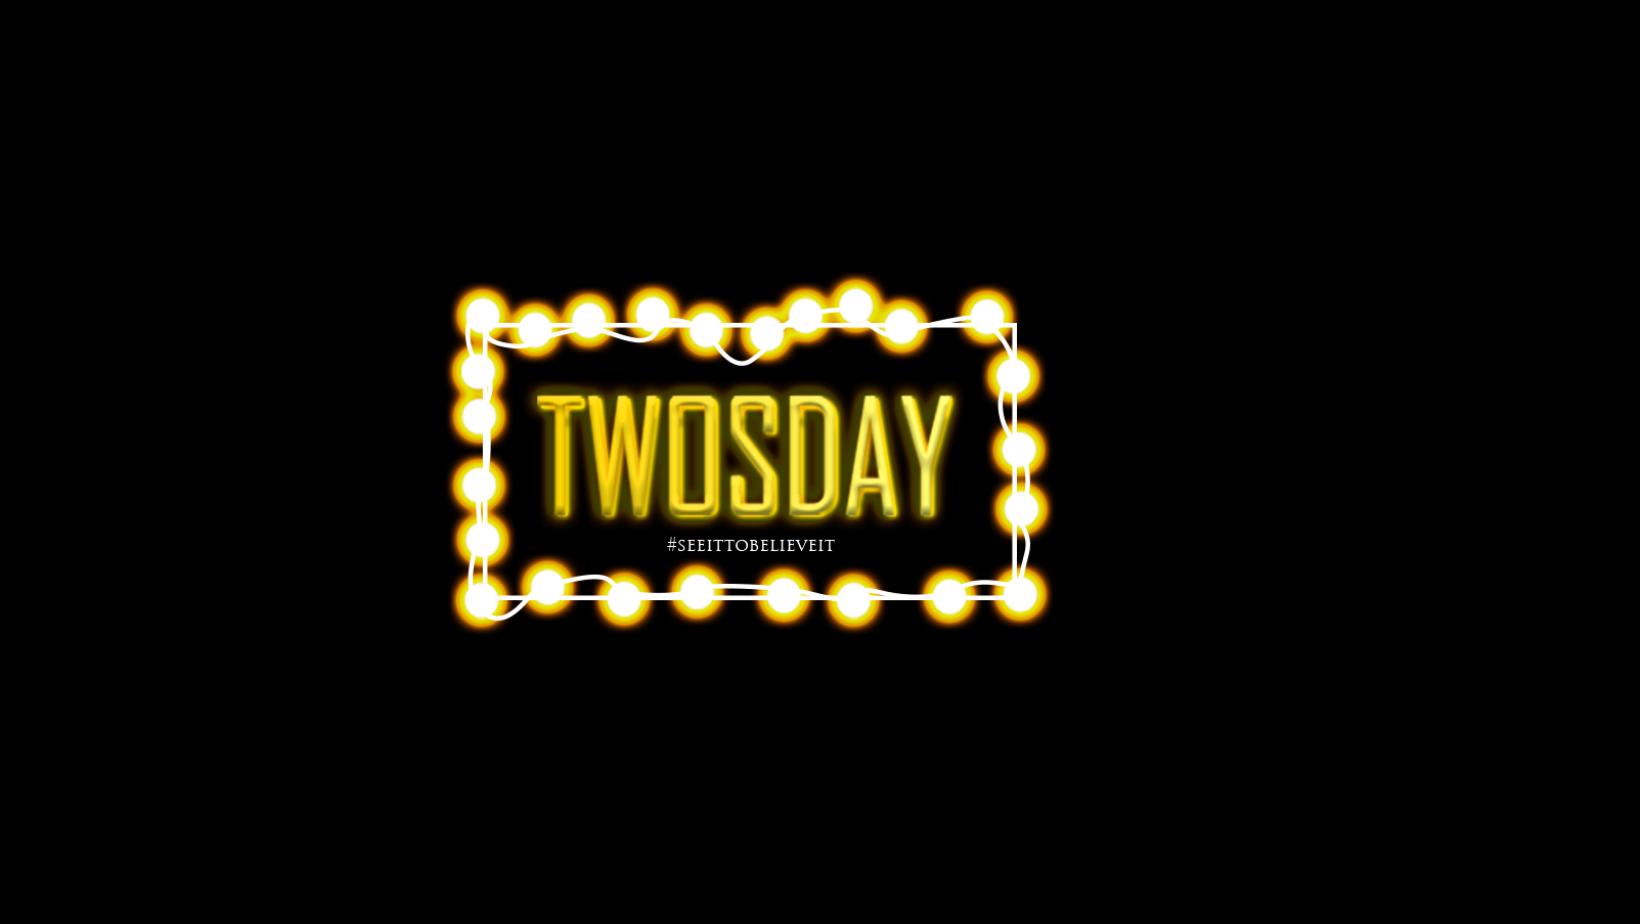 TWOSDAY - Weekly Tuesday - 2-4-1 Drinks - History Nightclub